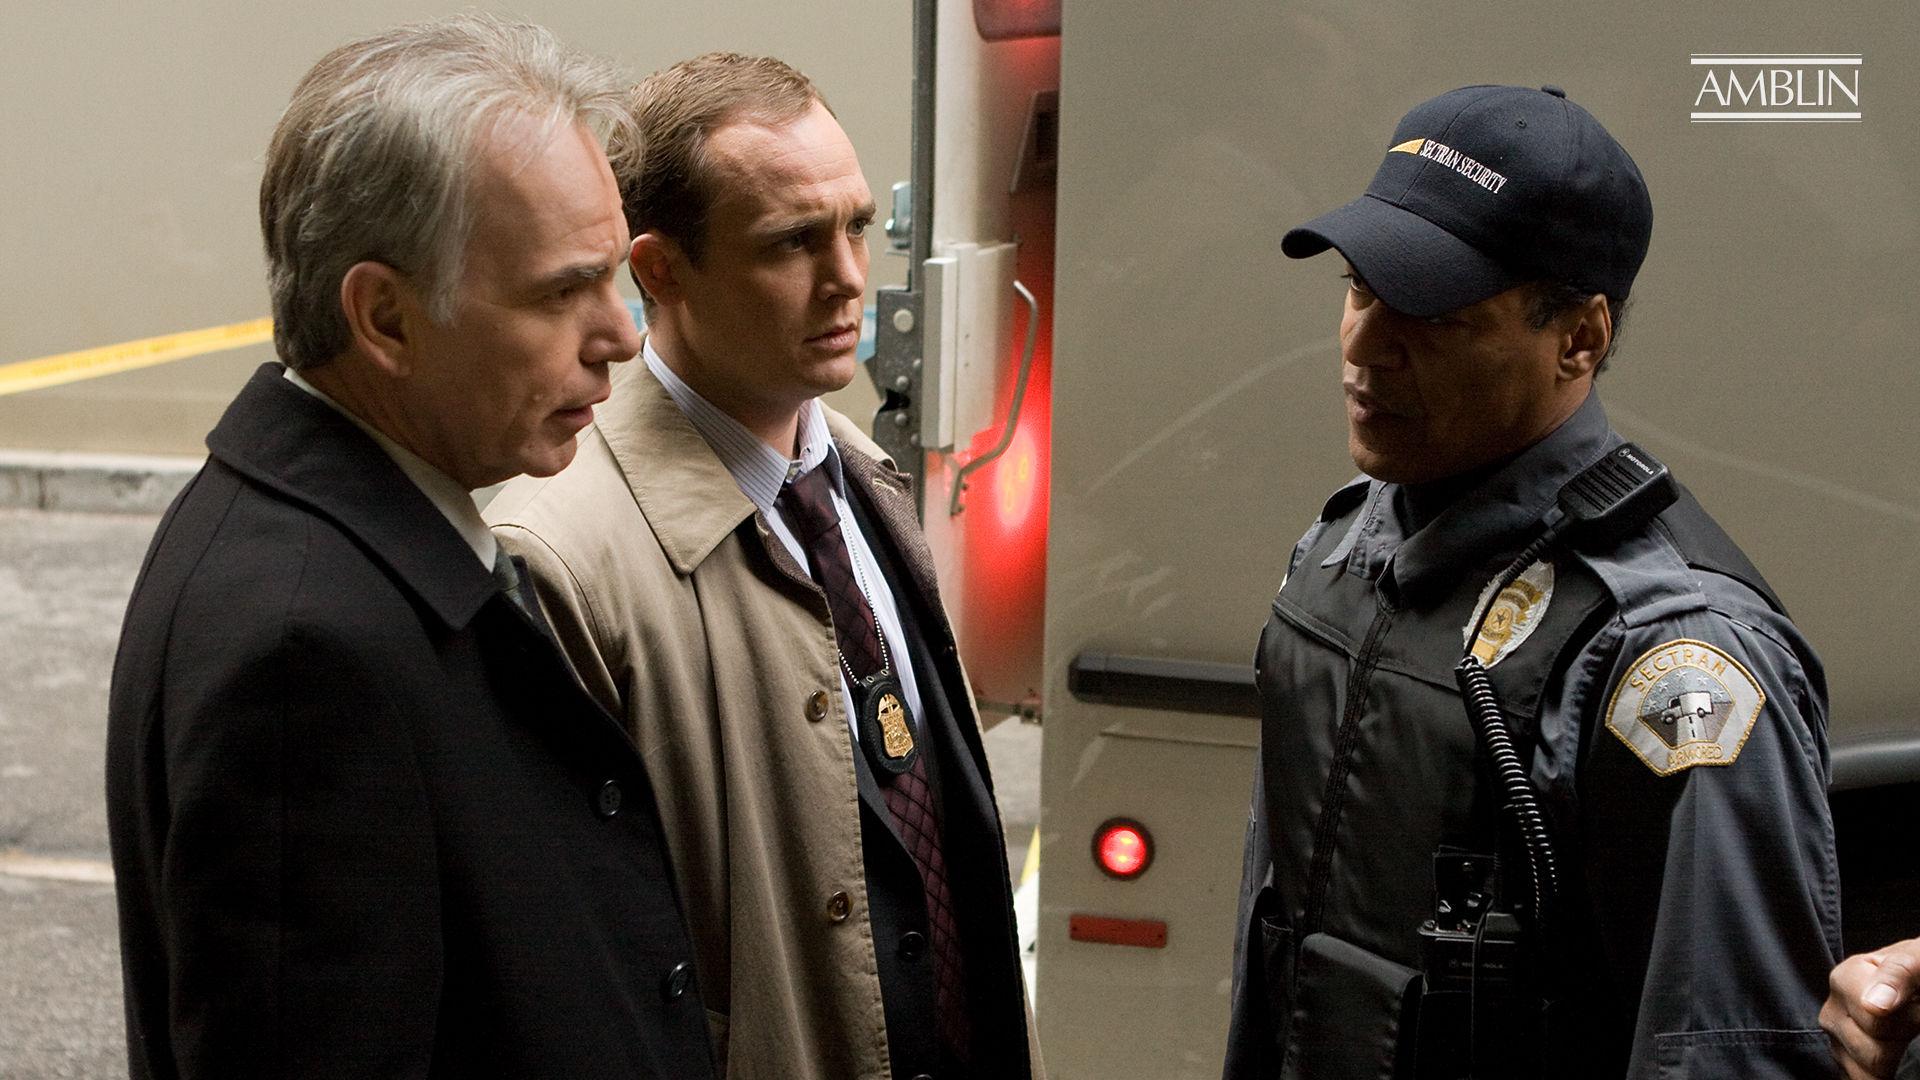 Eagle Eye 2008 About The Movie Amblin